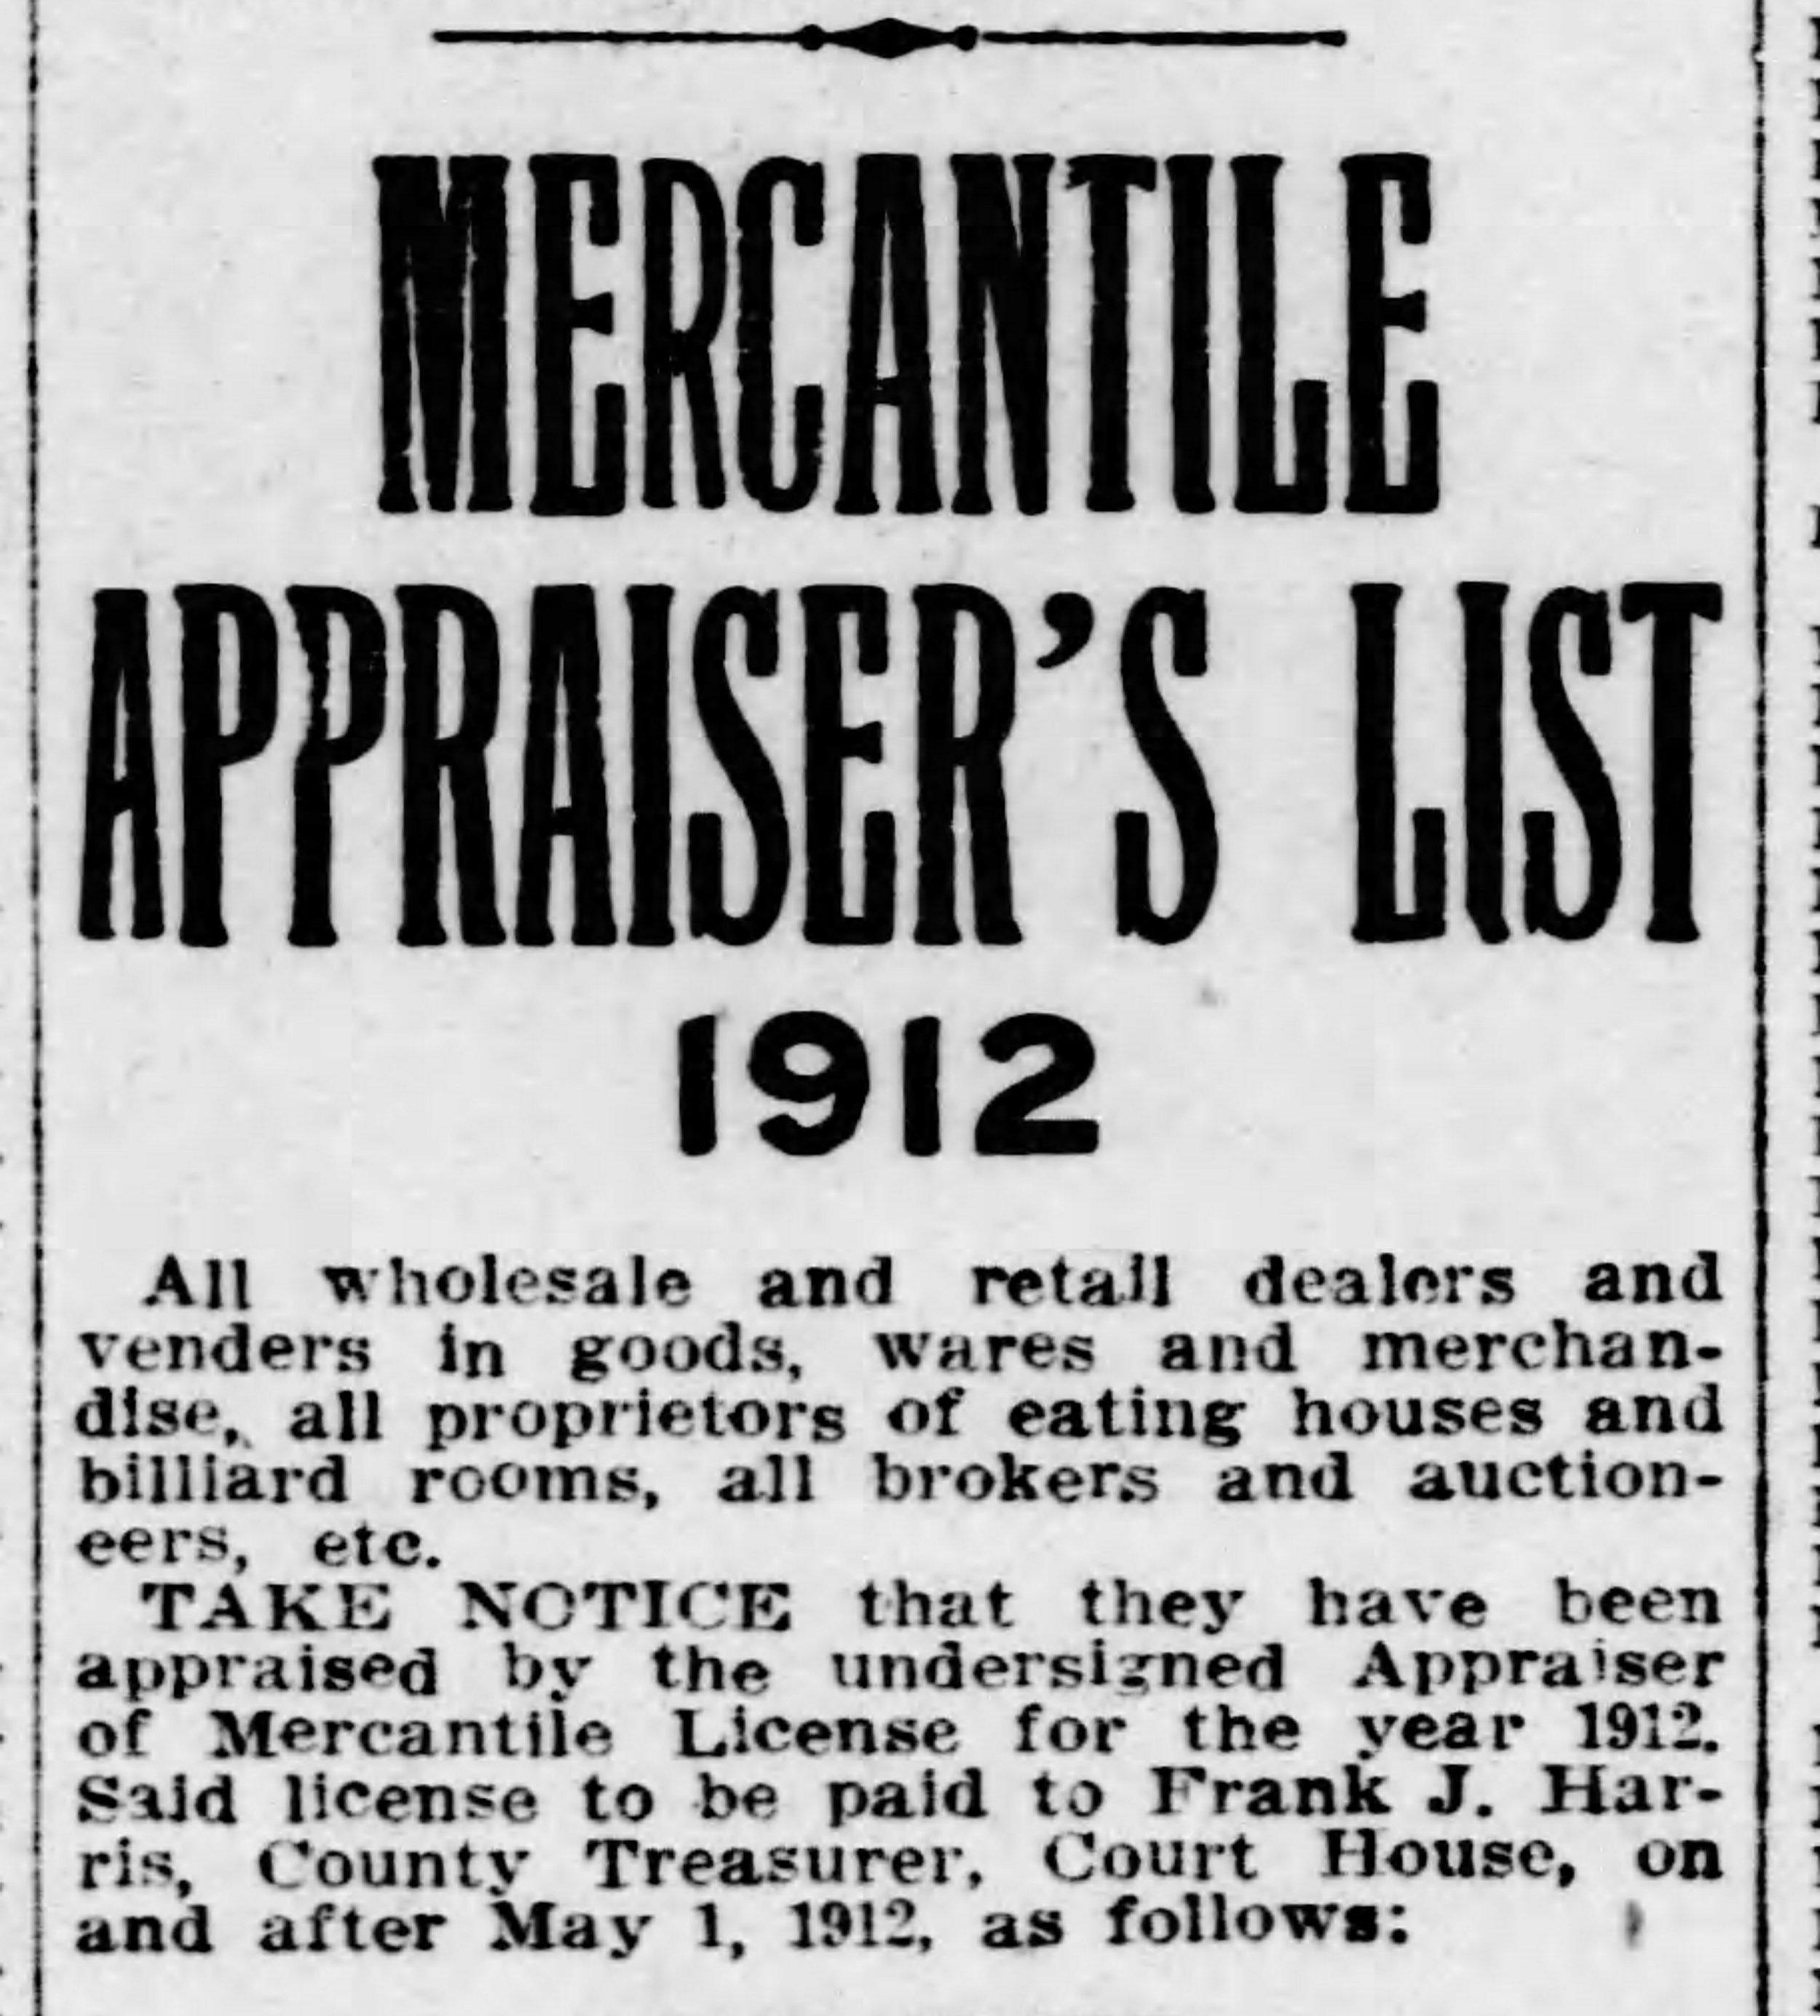 1912 - Pittsburgh_Daily_Post_Fri__Apr_19__1912_(1).jpg